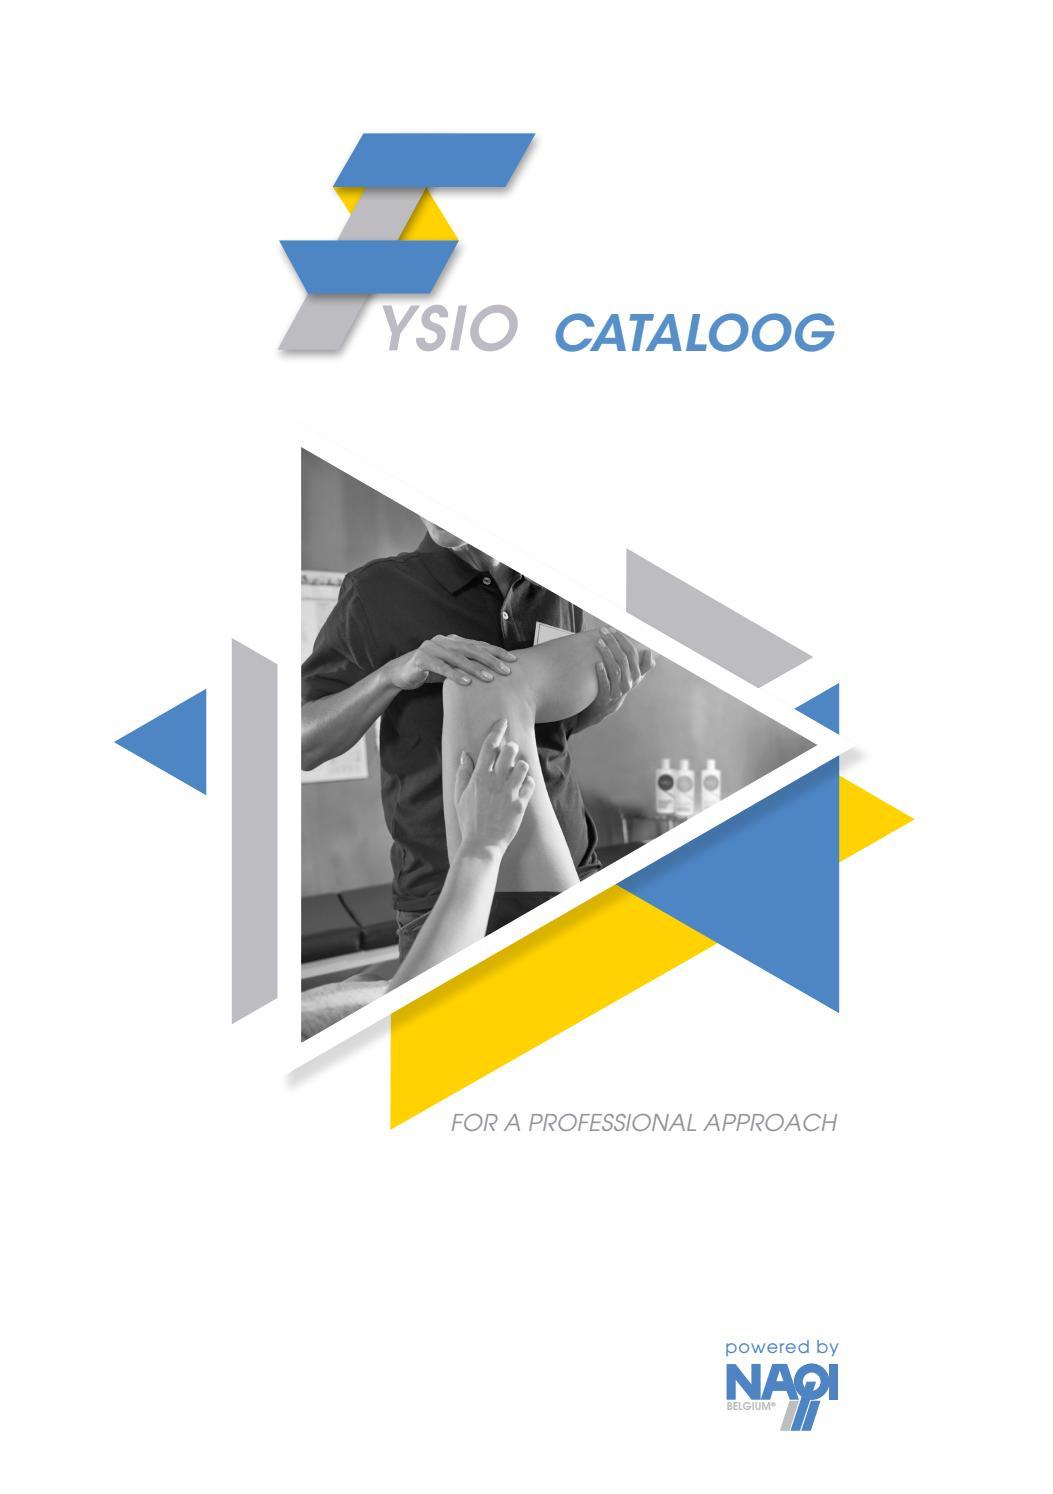 Uitgelezene Fysioshop cataloog 2019 - 2020 by Naqi Belgium - issuu EZ-82